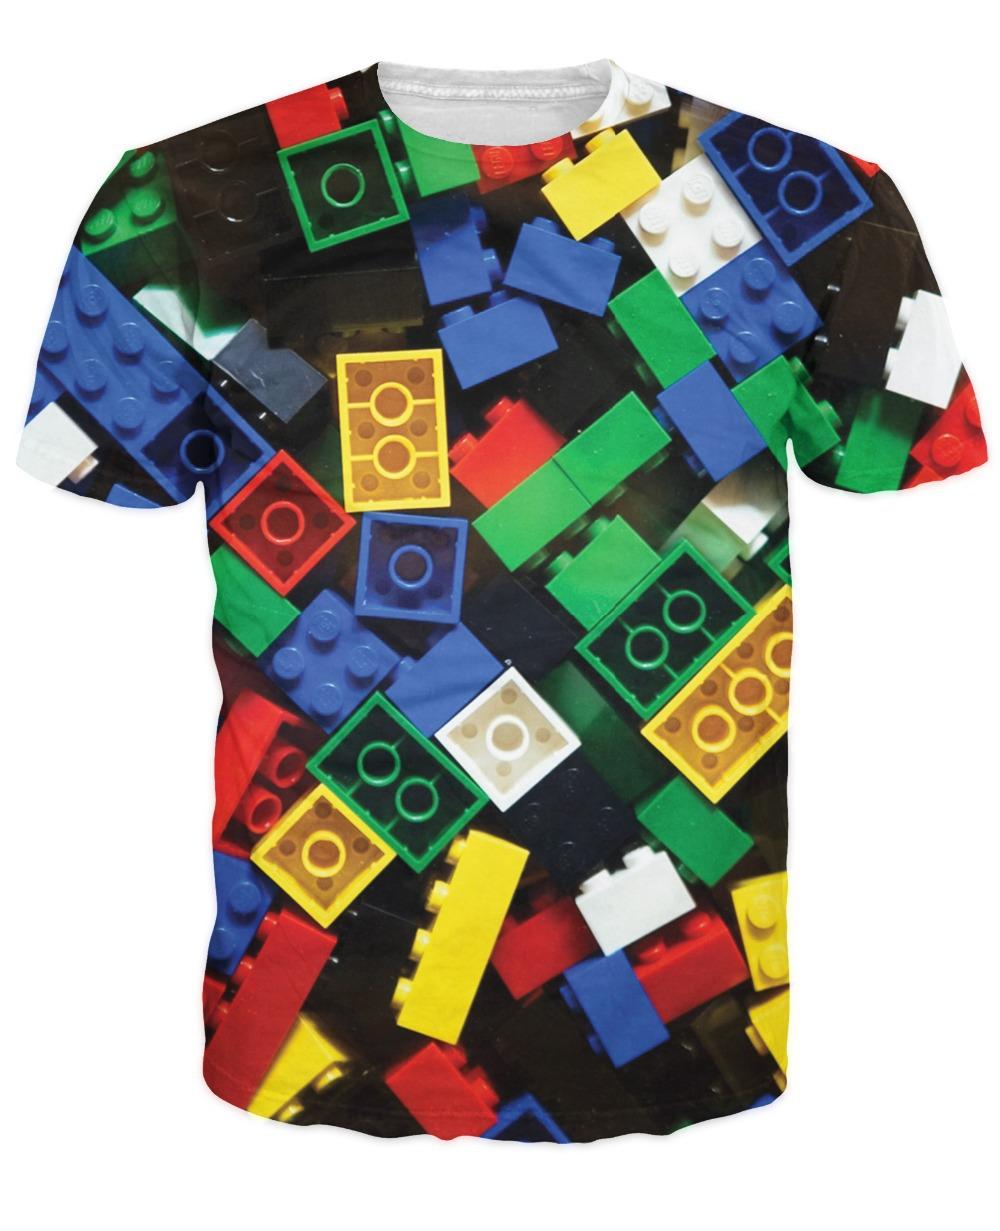 Summer Style Lego Bricks T-Shirt super popular children's toy 3d print t shirt camisetas for Unisex Women Men Plus Size S-XXL(China (Mainland))